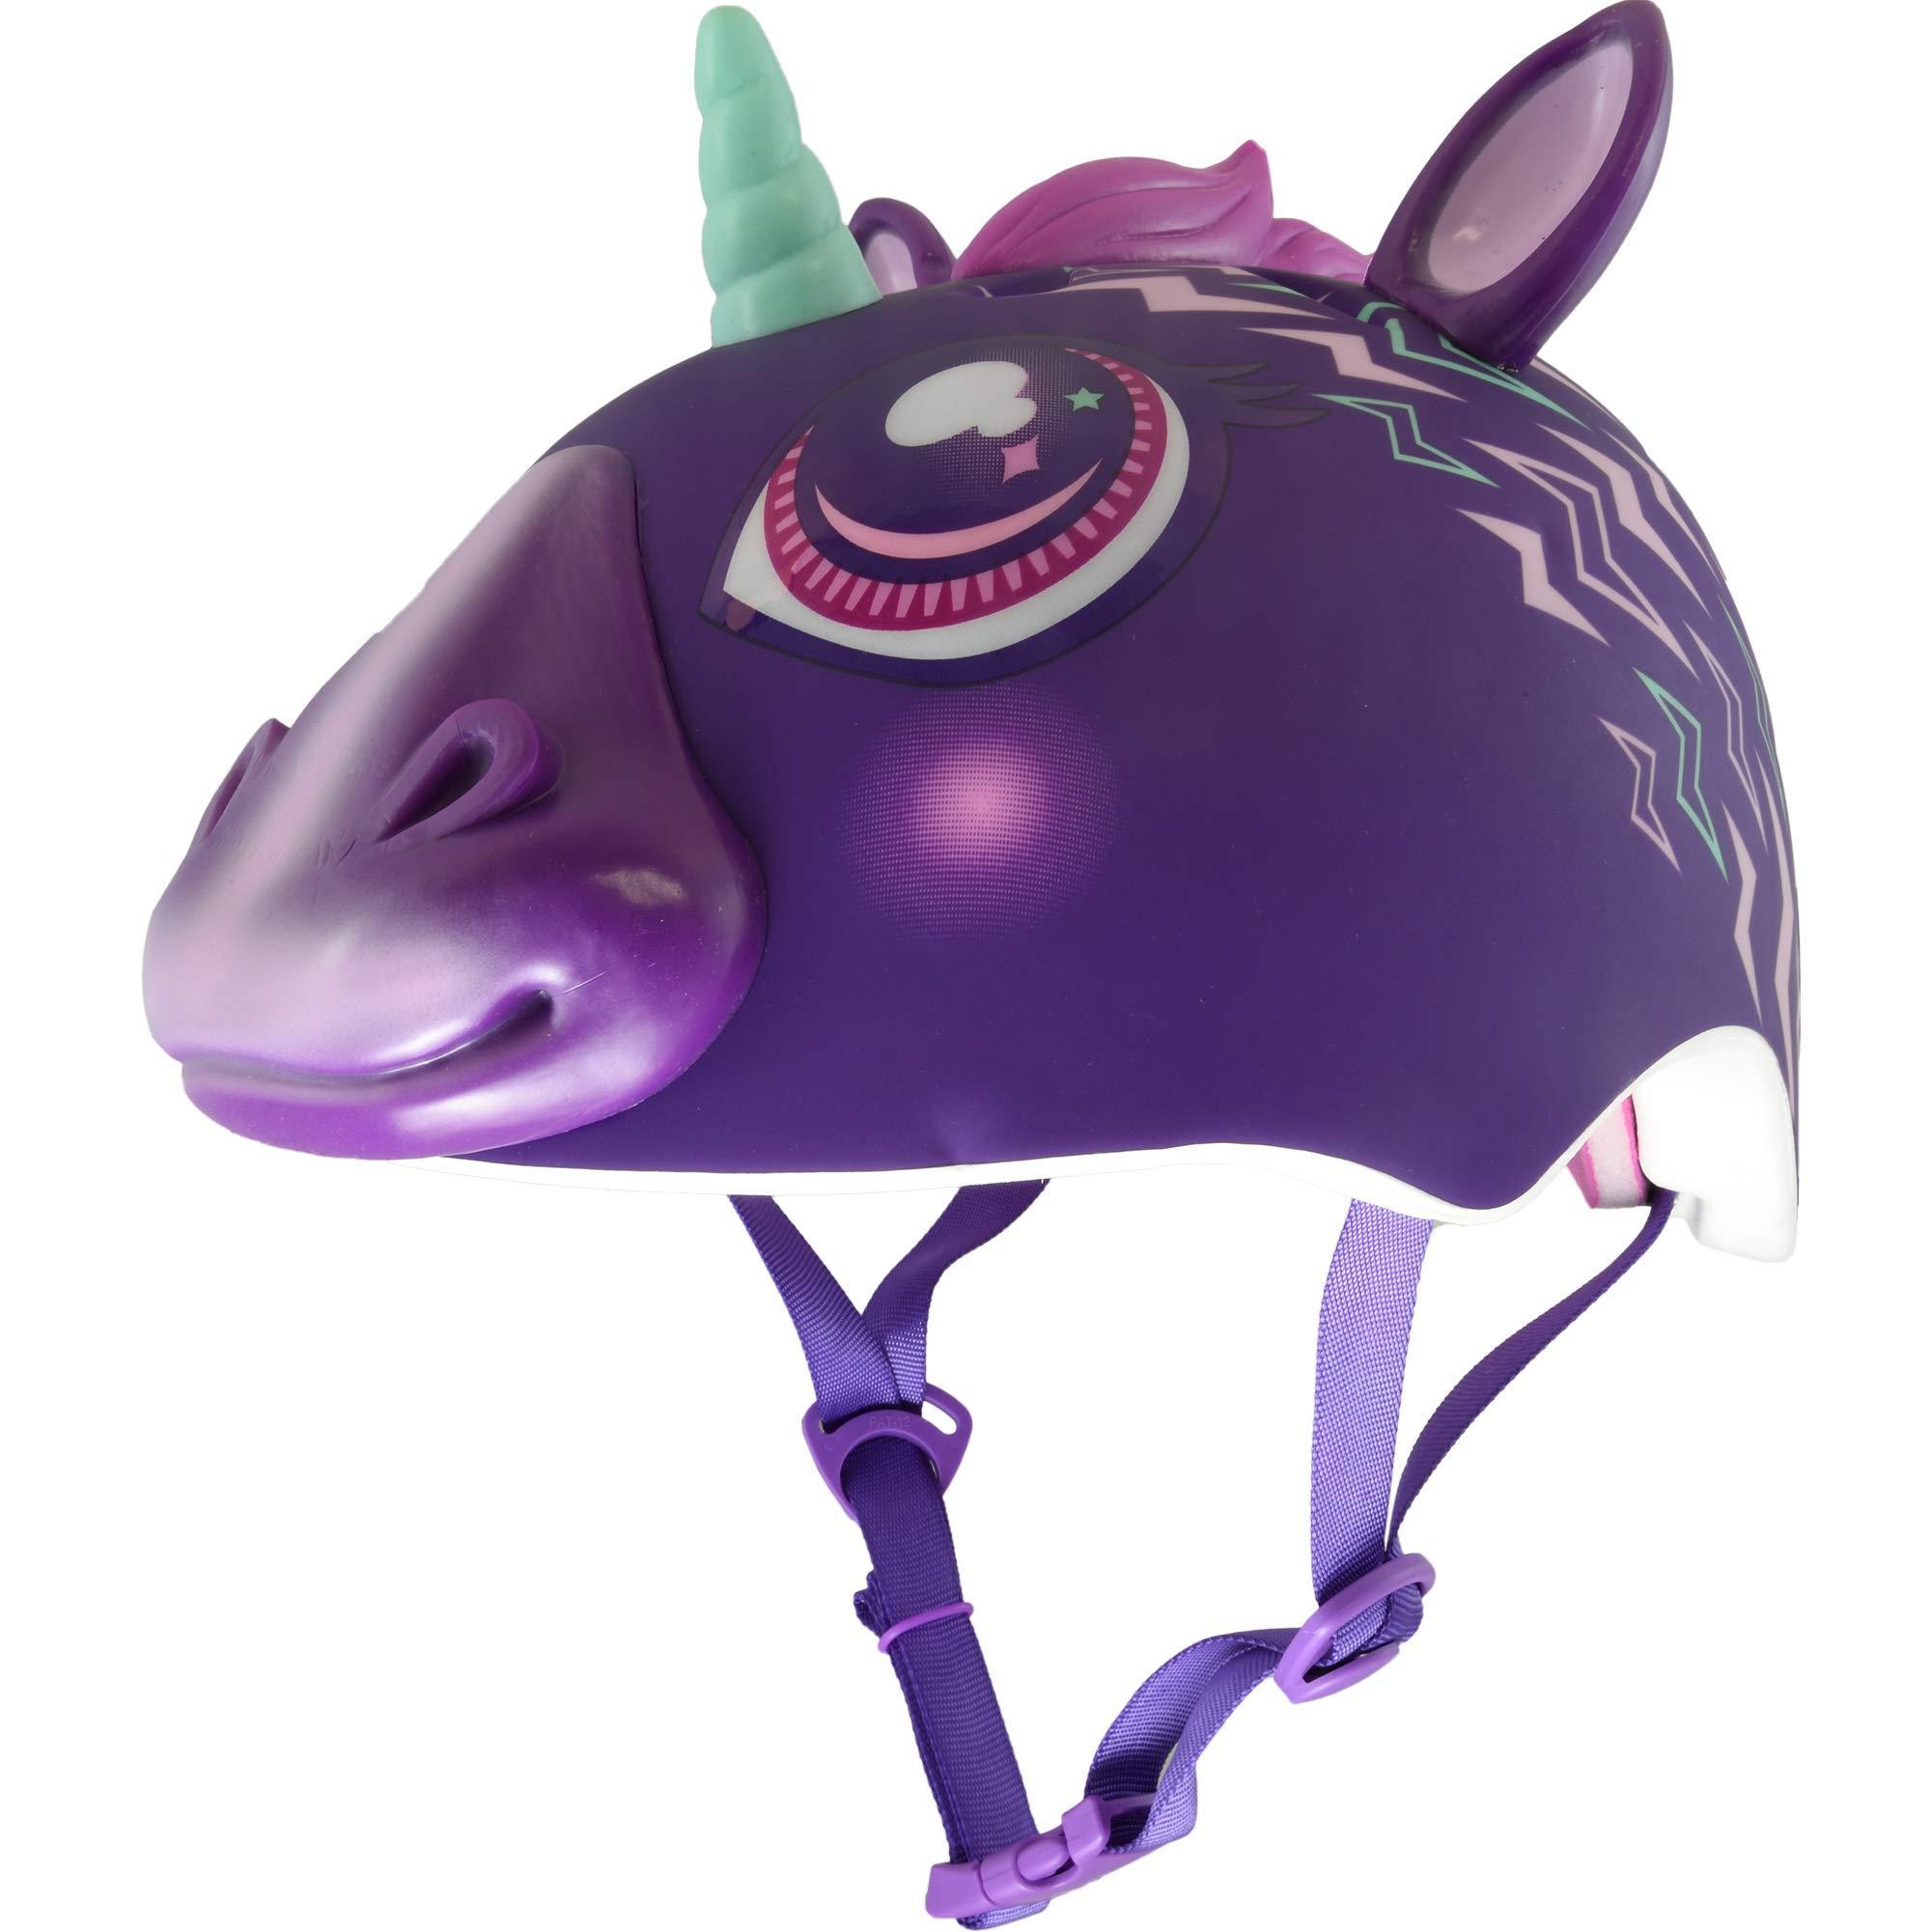 Raskullz Electric Unicorn TPR Child 5+ Helmet, Electric Purple